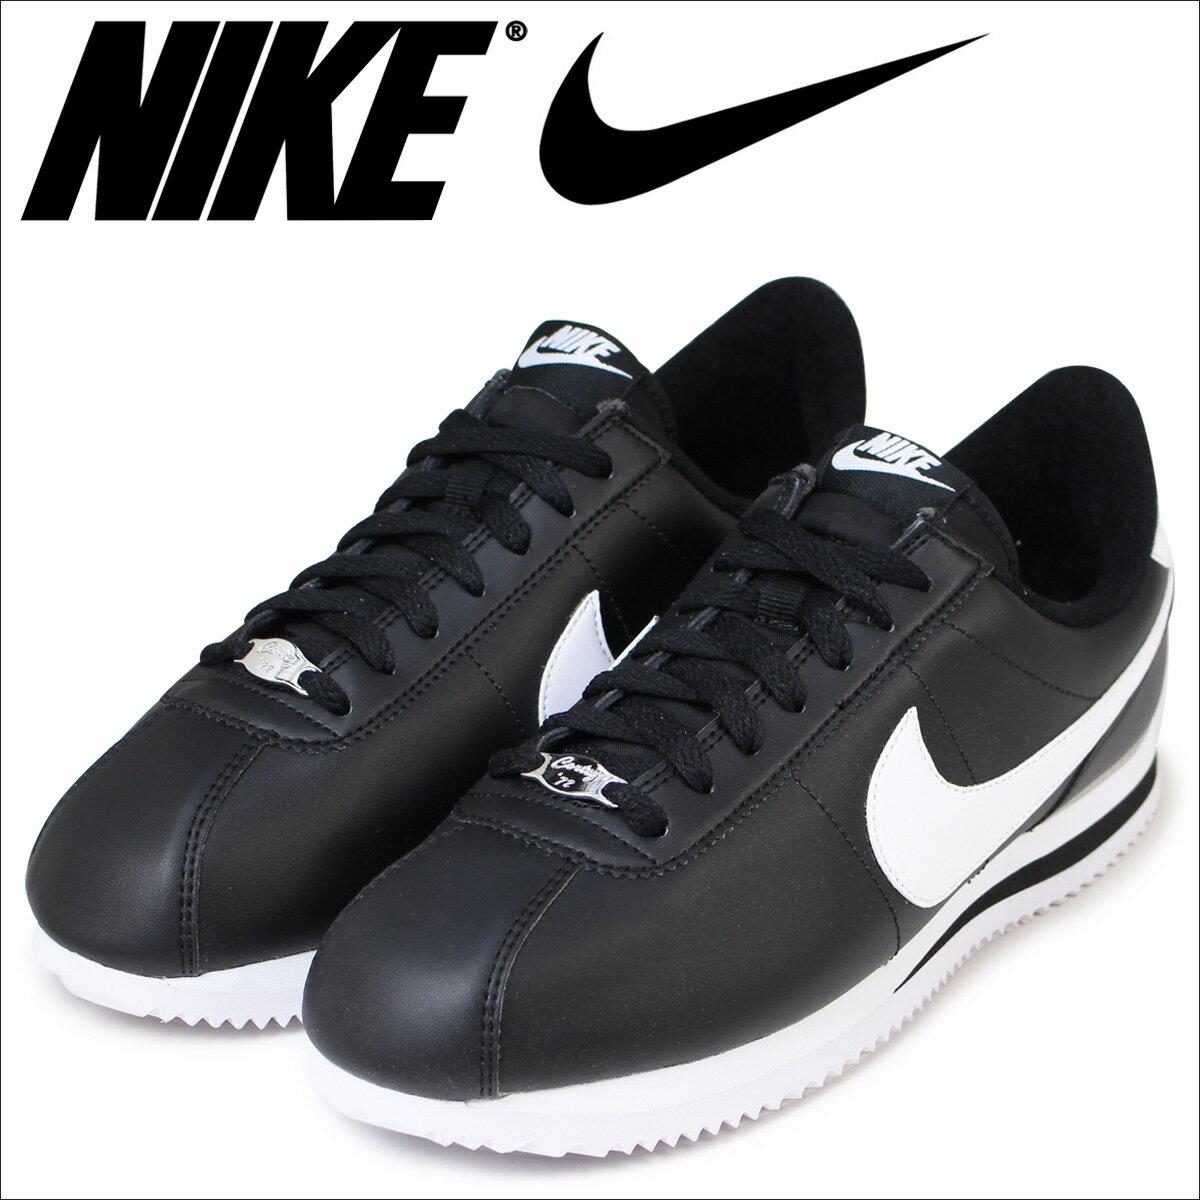 NIKE ナイキ コルテッツ スニーカー CORTEZ BASIC LEATHER 819719-012 メンズ 靴 ブラック